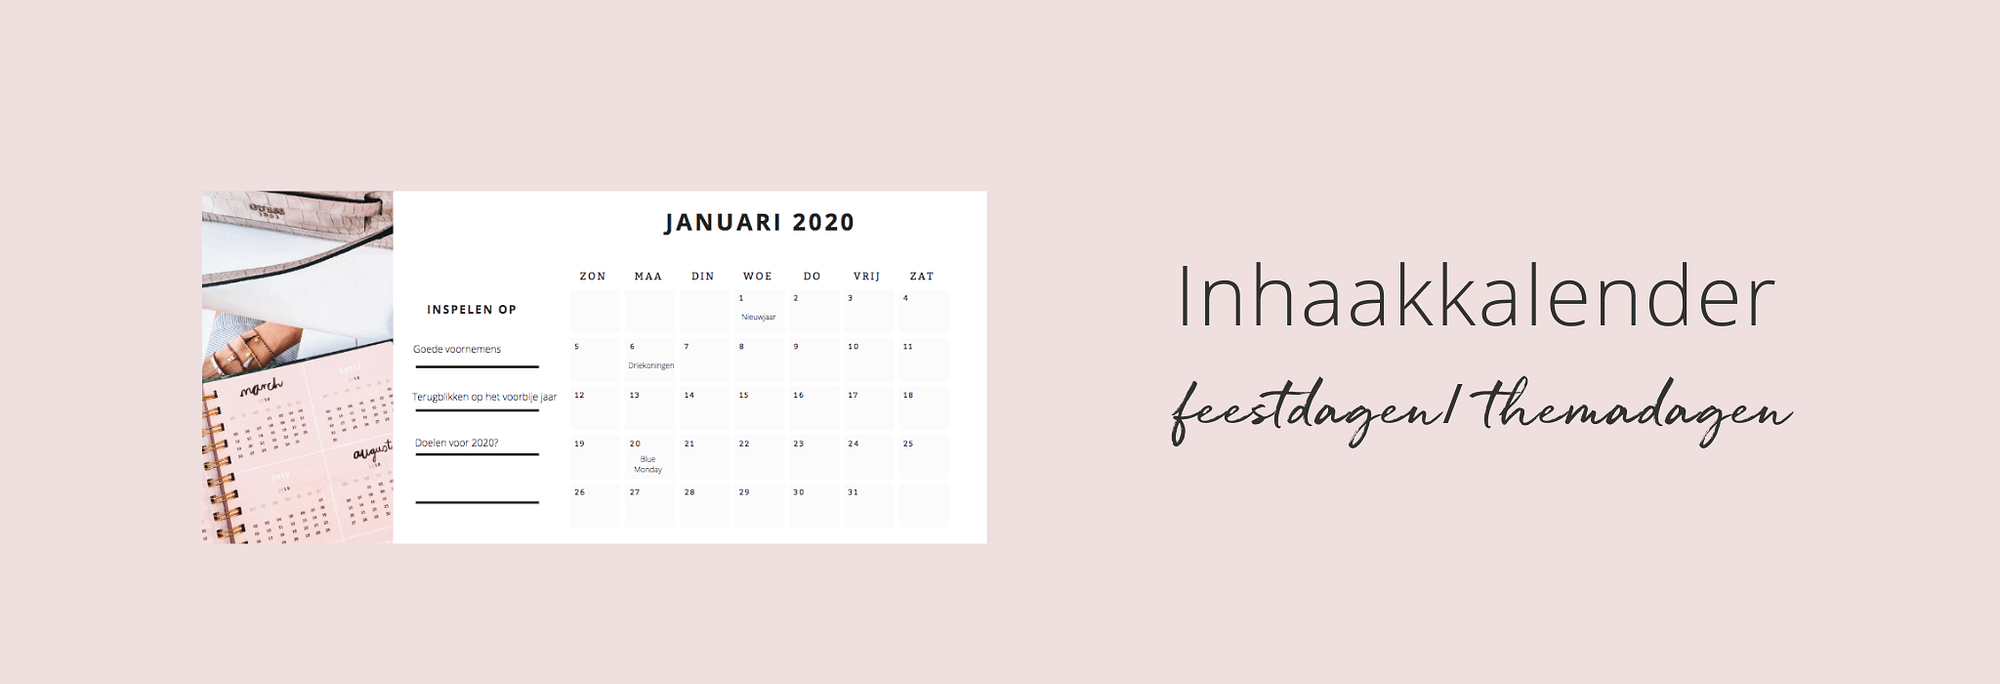 Inhaakkalender 2020 voor je volgende social media posts (1)